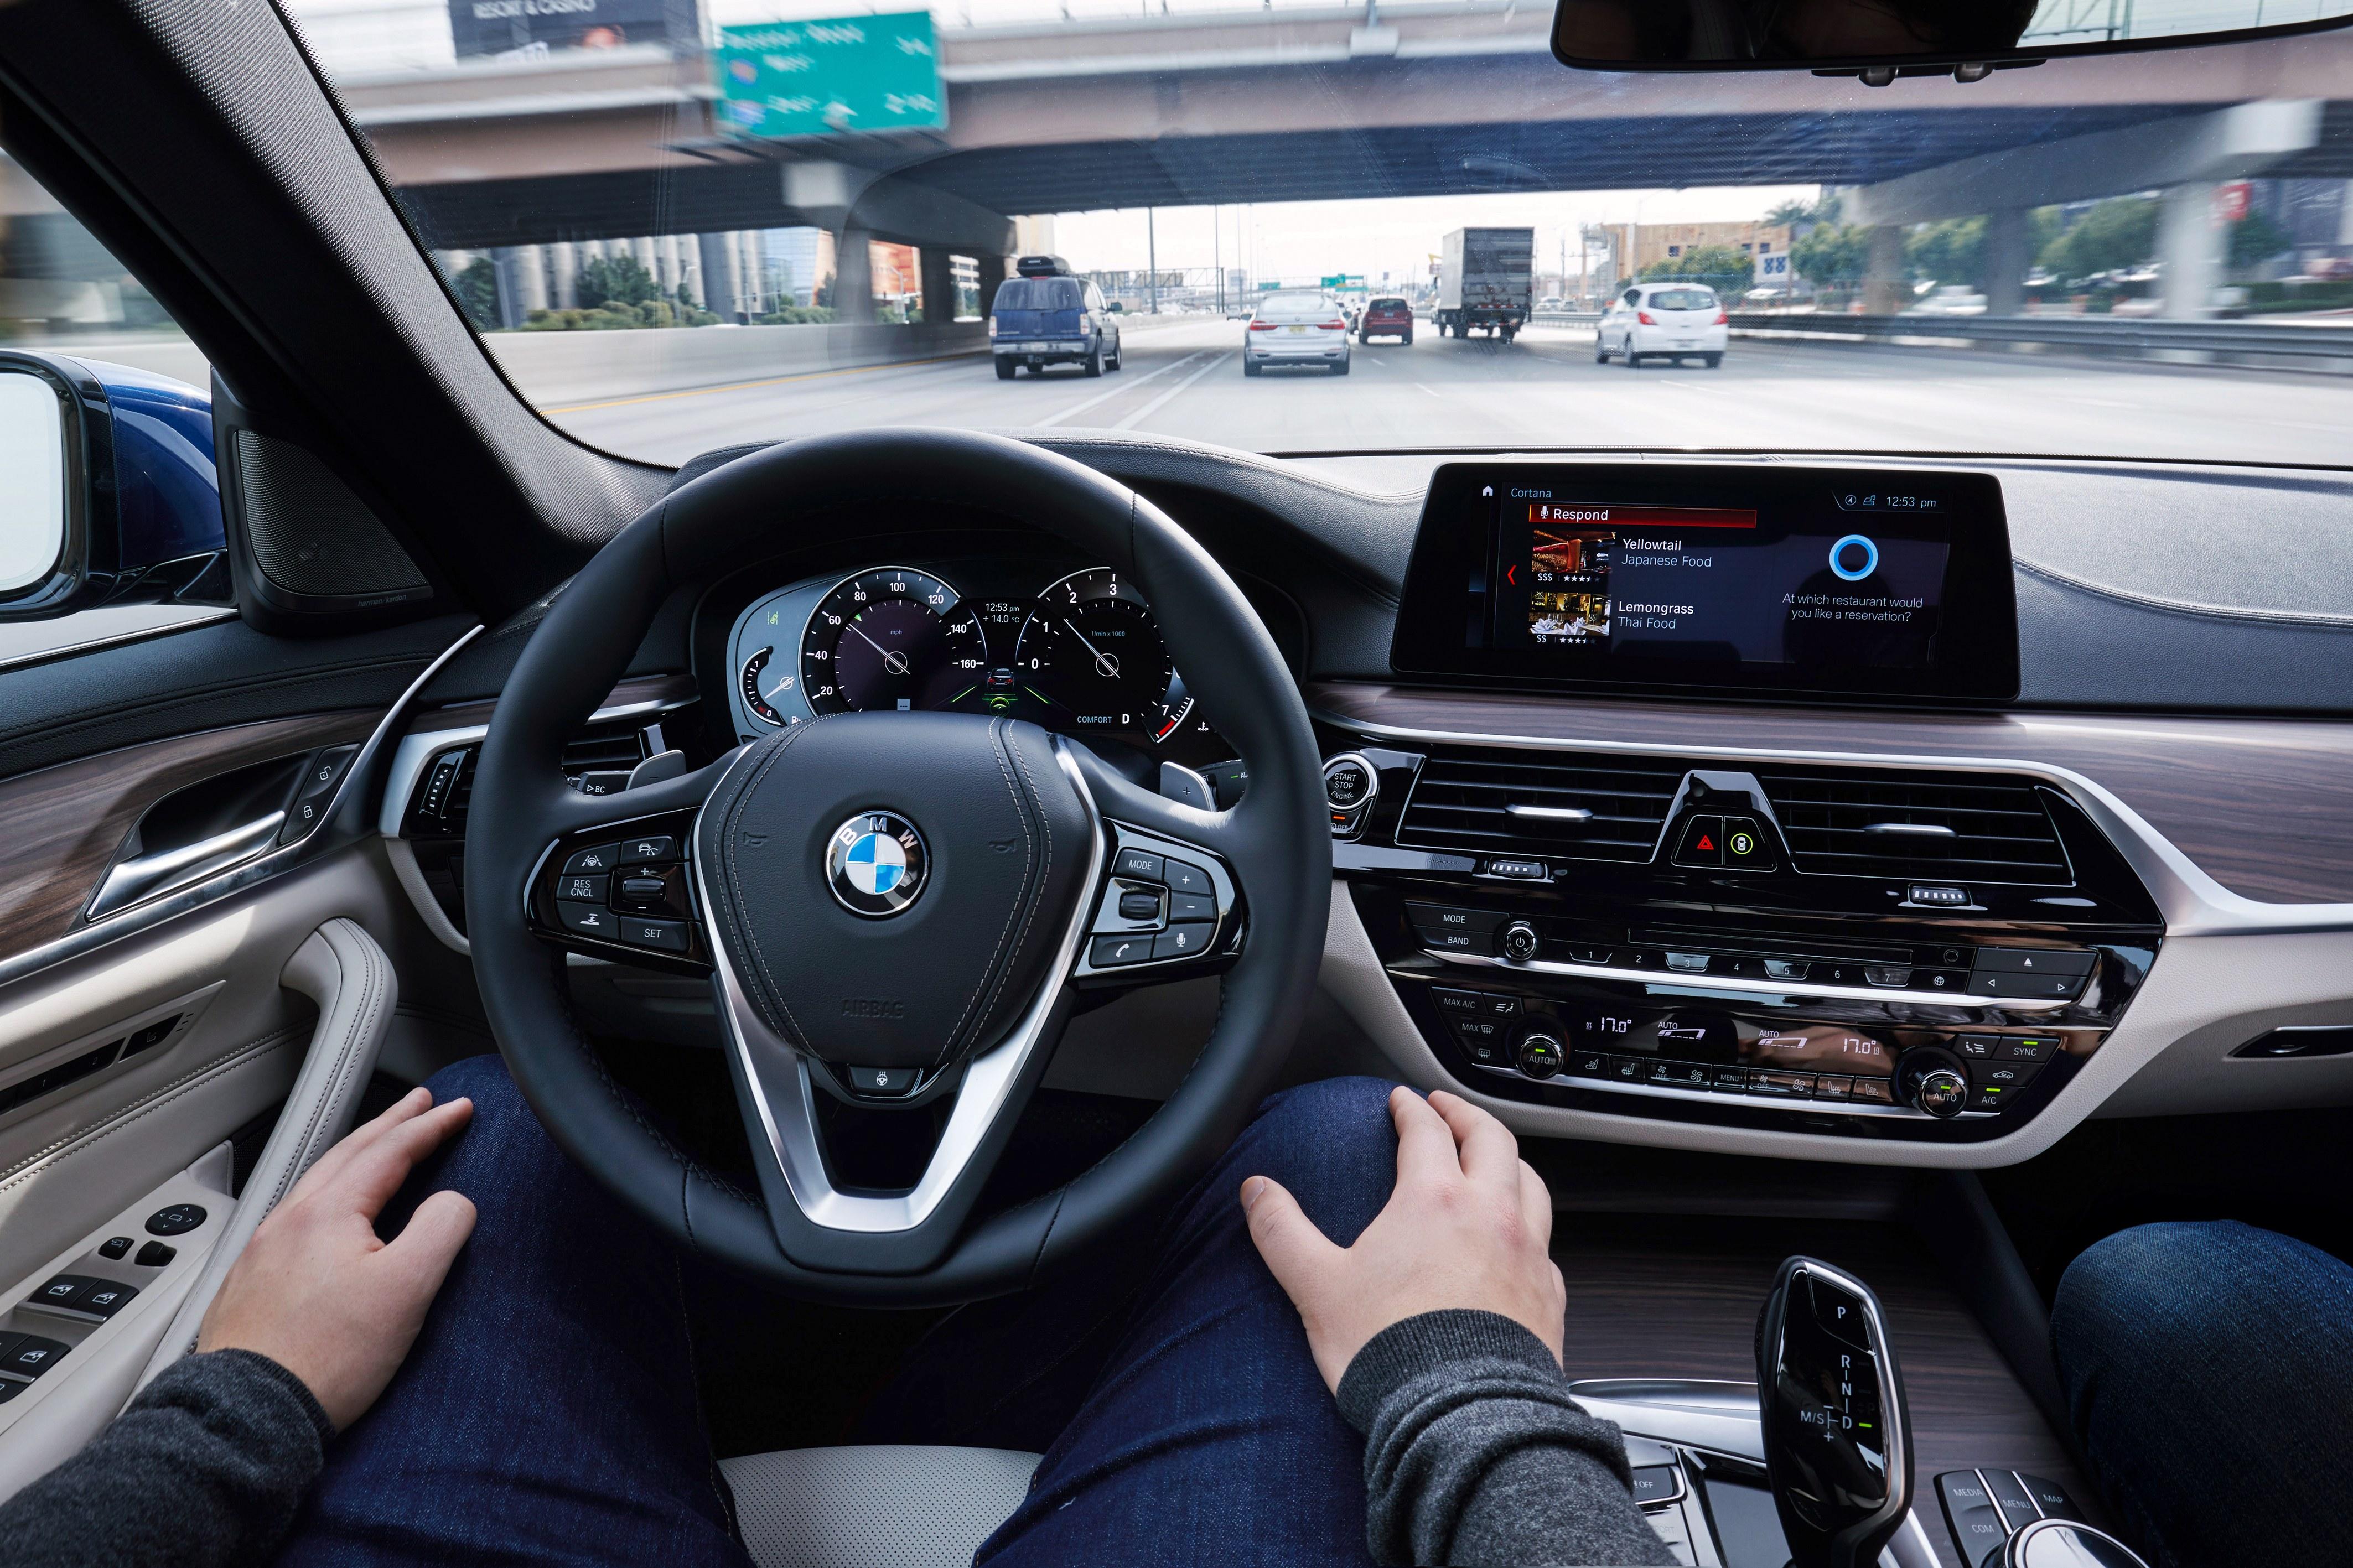 BMW autonomous vehicles coming in 2021 - Photos